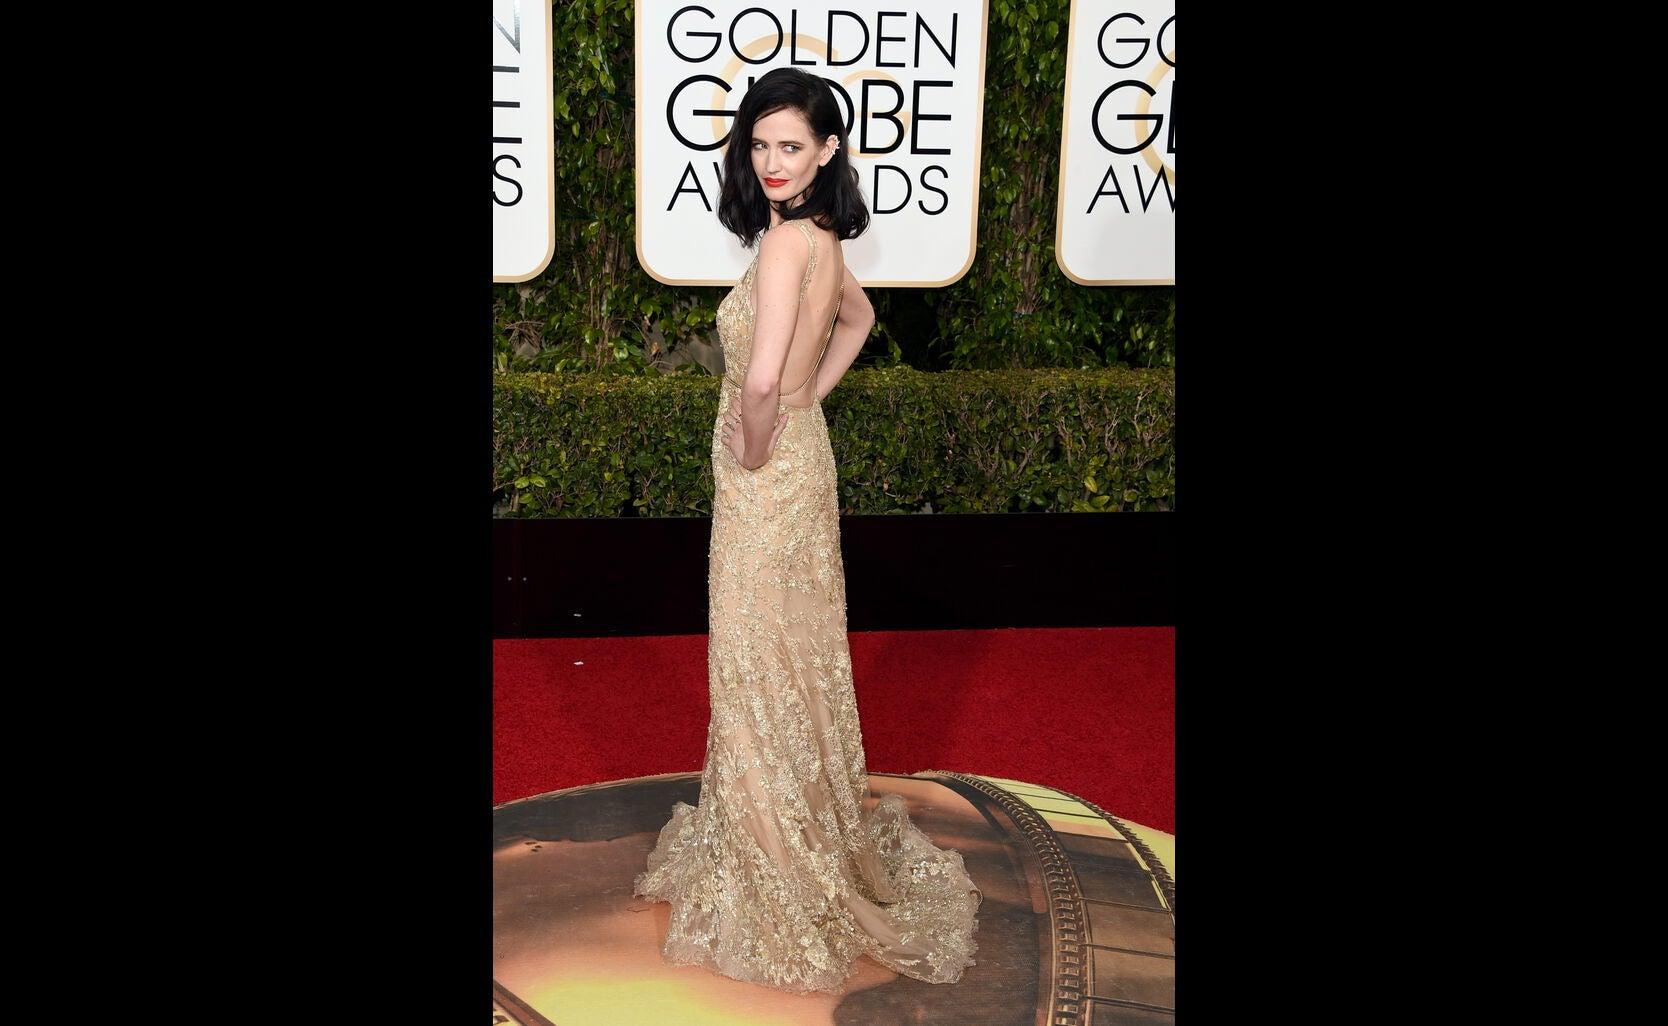 Eva Green at The Golden Globes